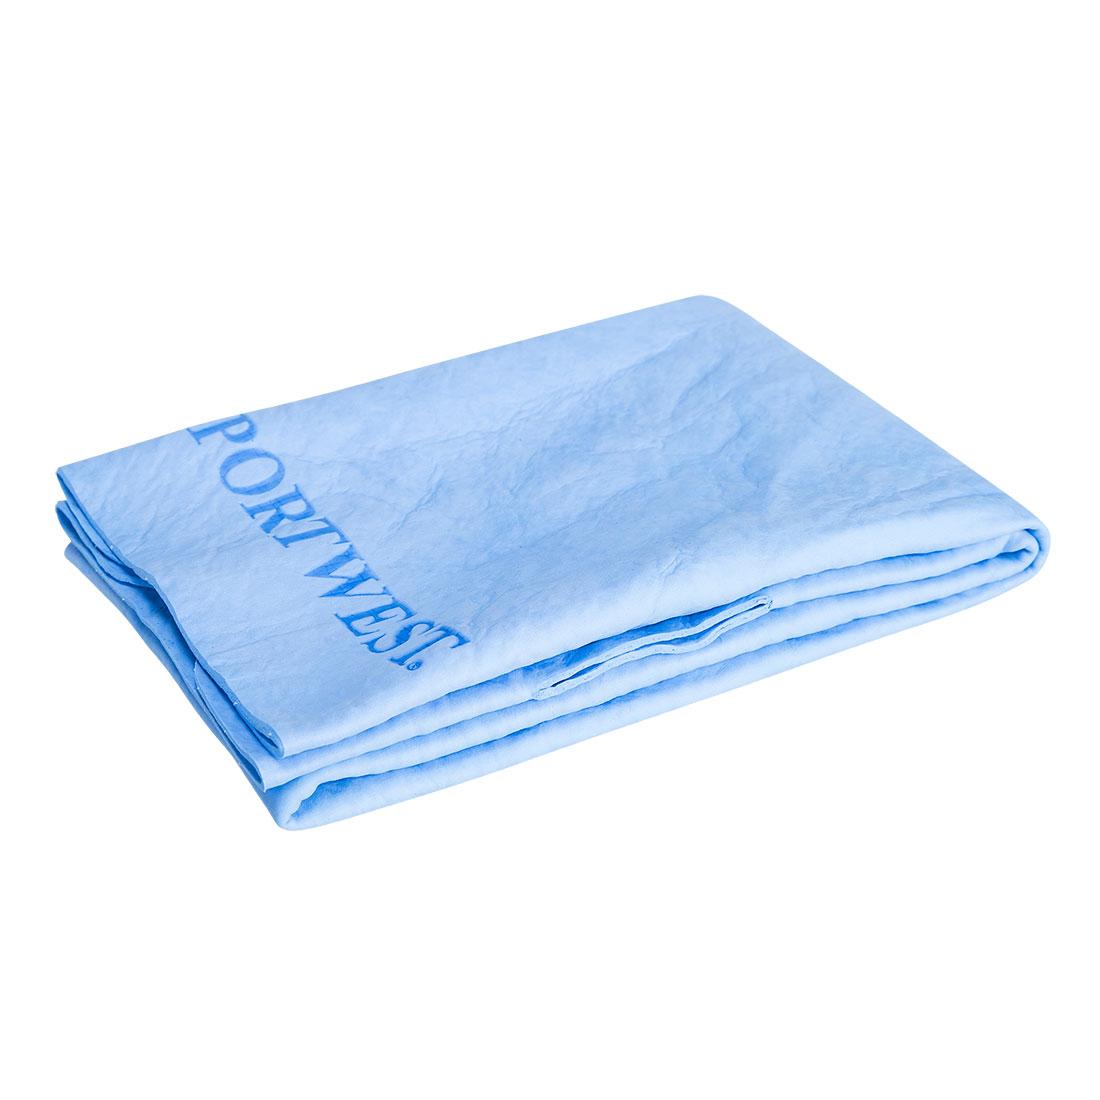 Cooling Towel, Blue  U/Fit